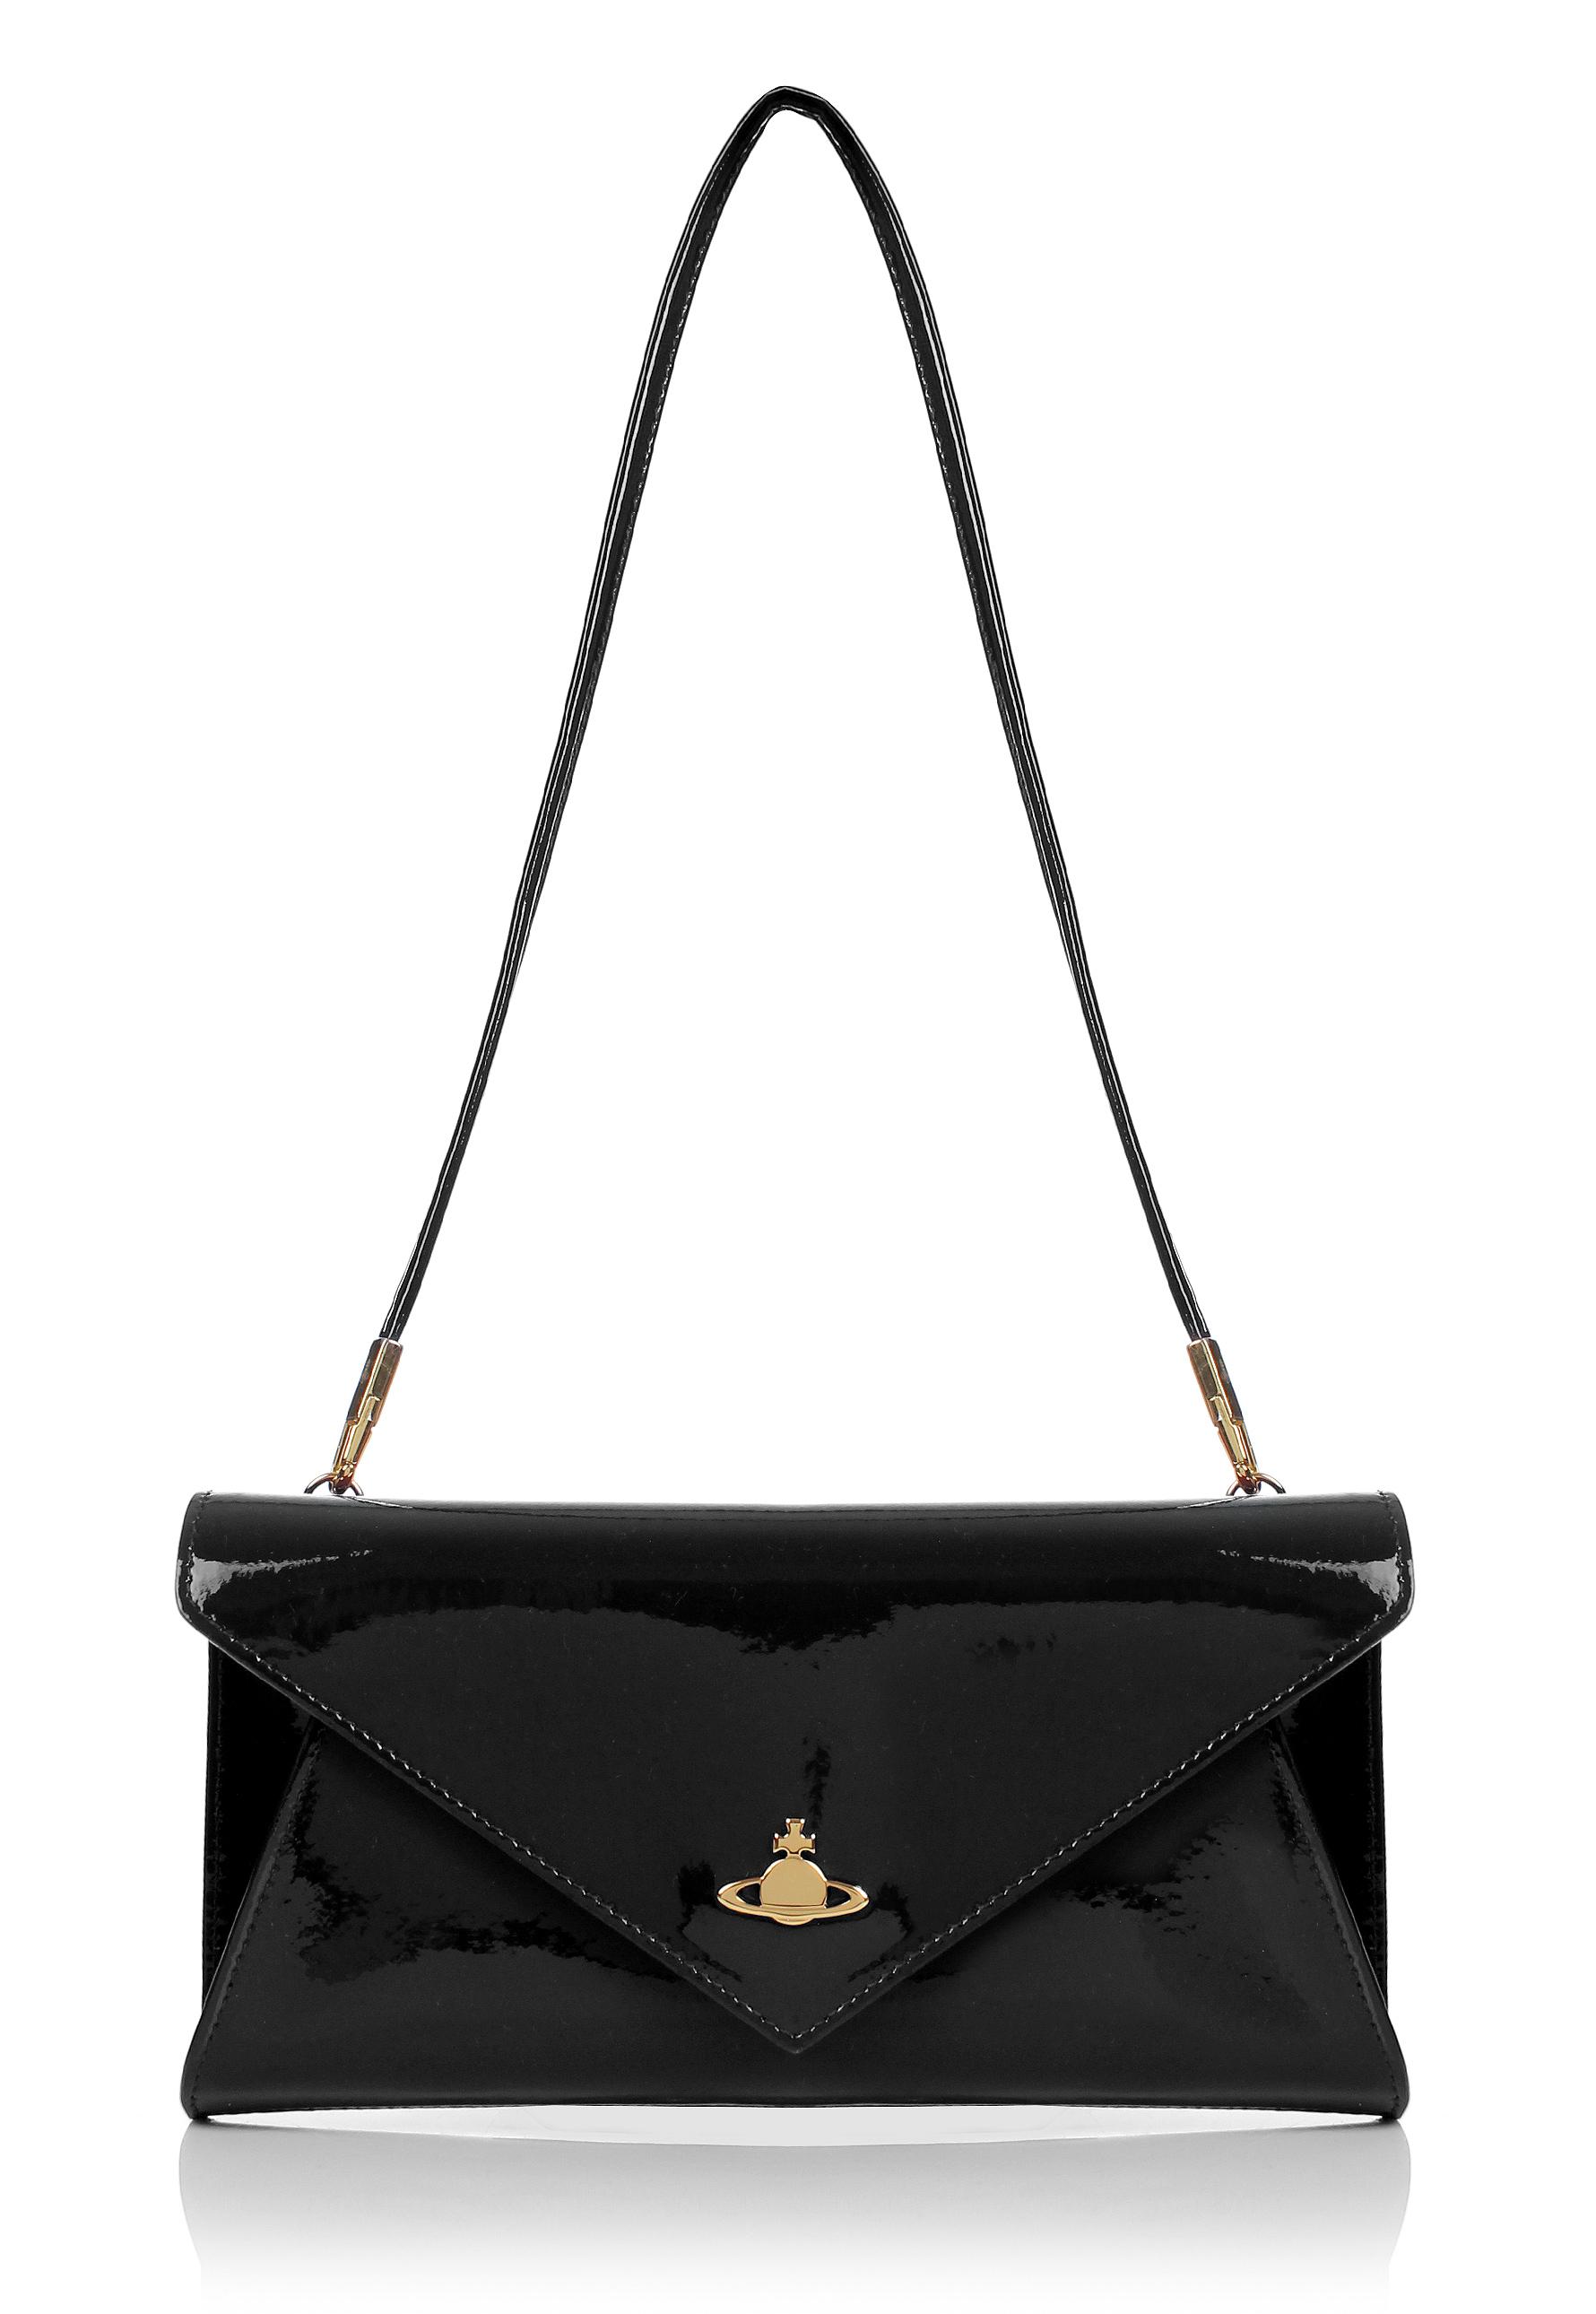 f354e26b83 Vivienne Westwood Mirror Ball 6700 Envelope Crossbody Black in Black ...